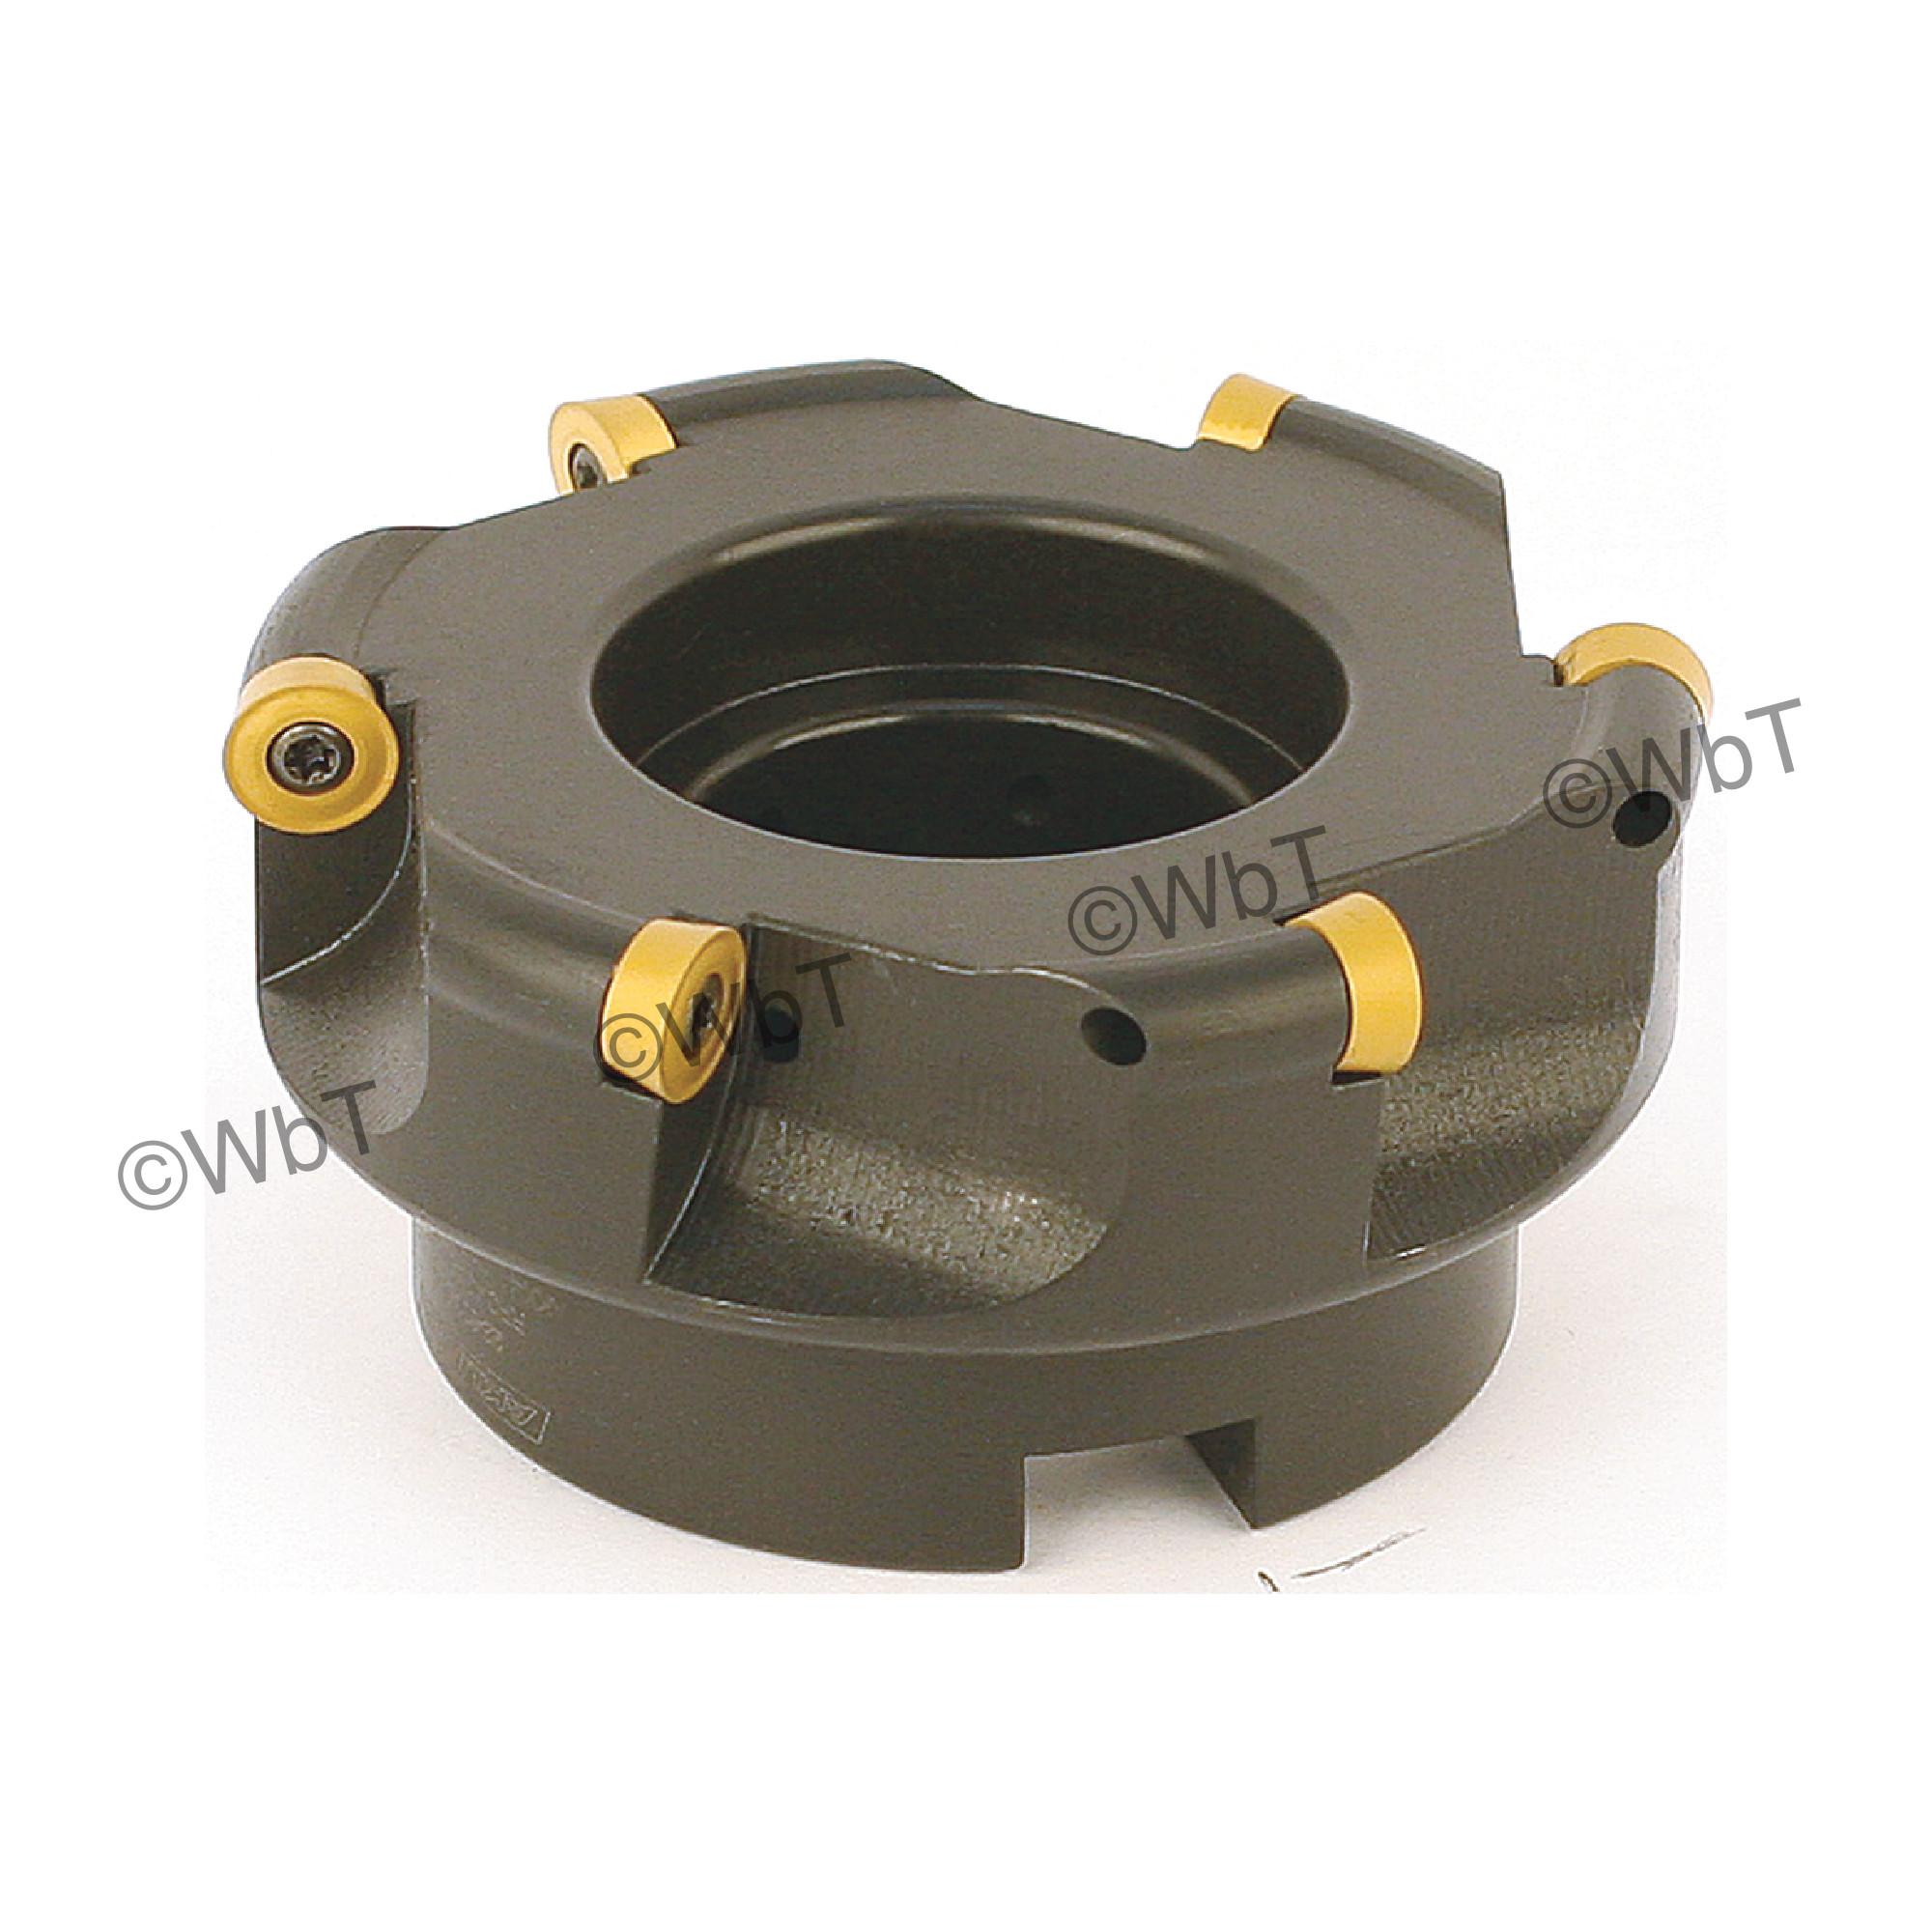 "AKUMA - 4.000"" Face Mill Set / Includes: (1) RPC.43.400R-6 (3.0""ø) & (10) RPMT1204M0S-M1 CM30P Coated Inserts / R"